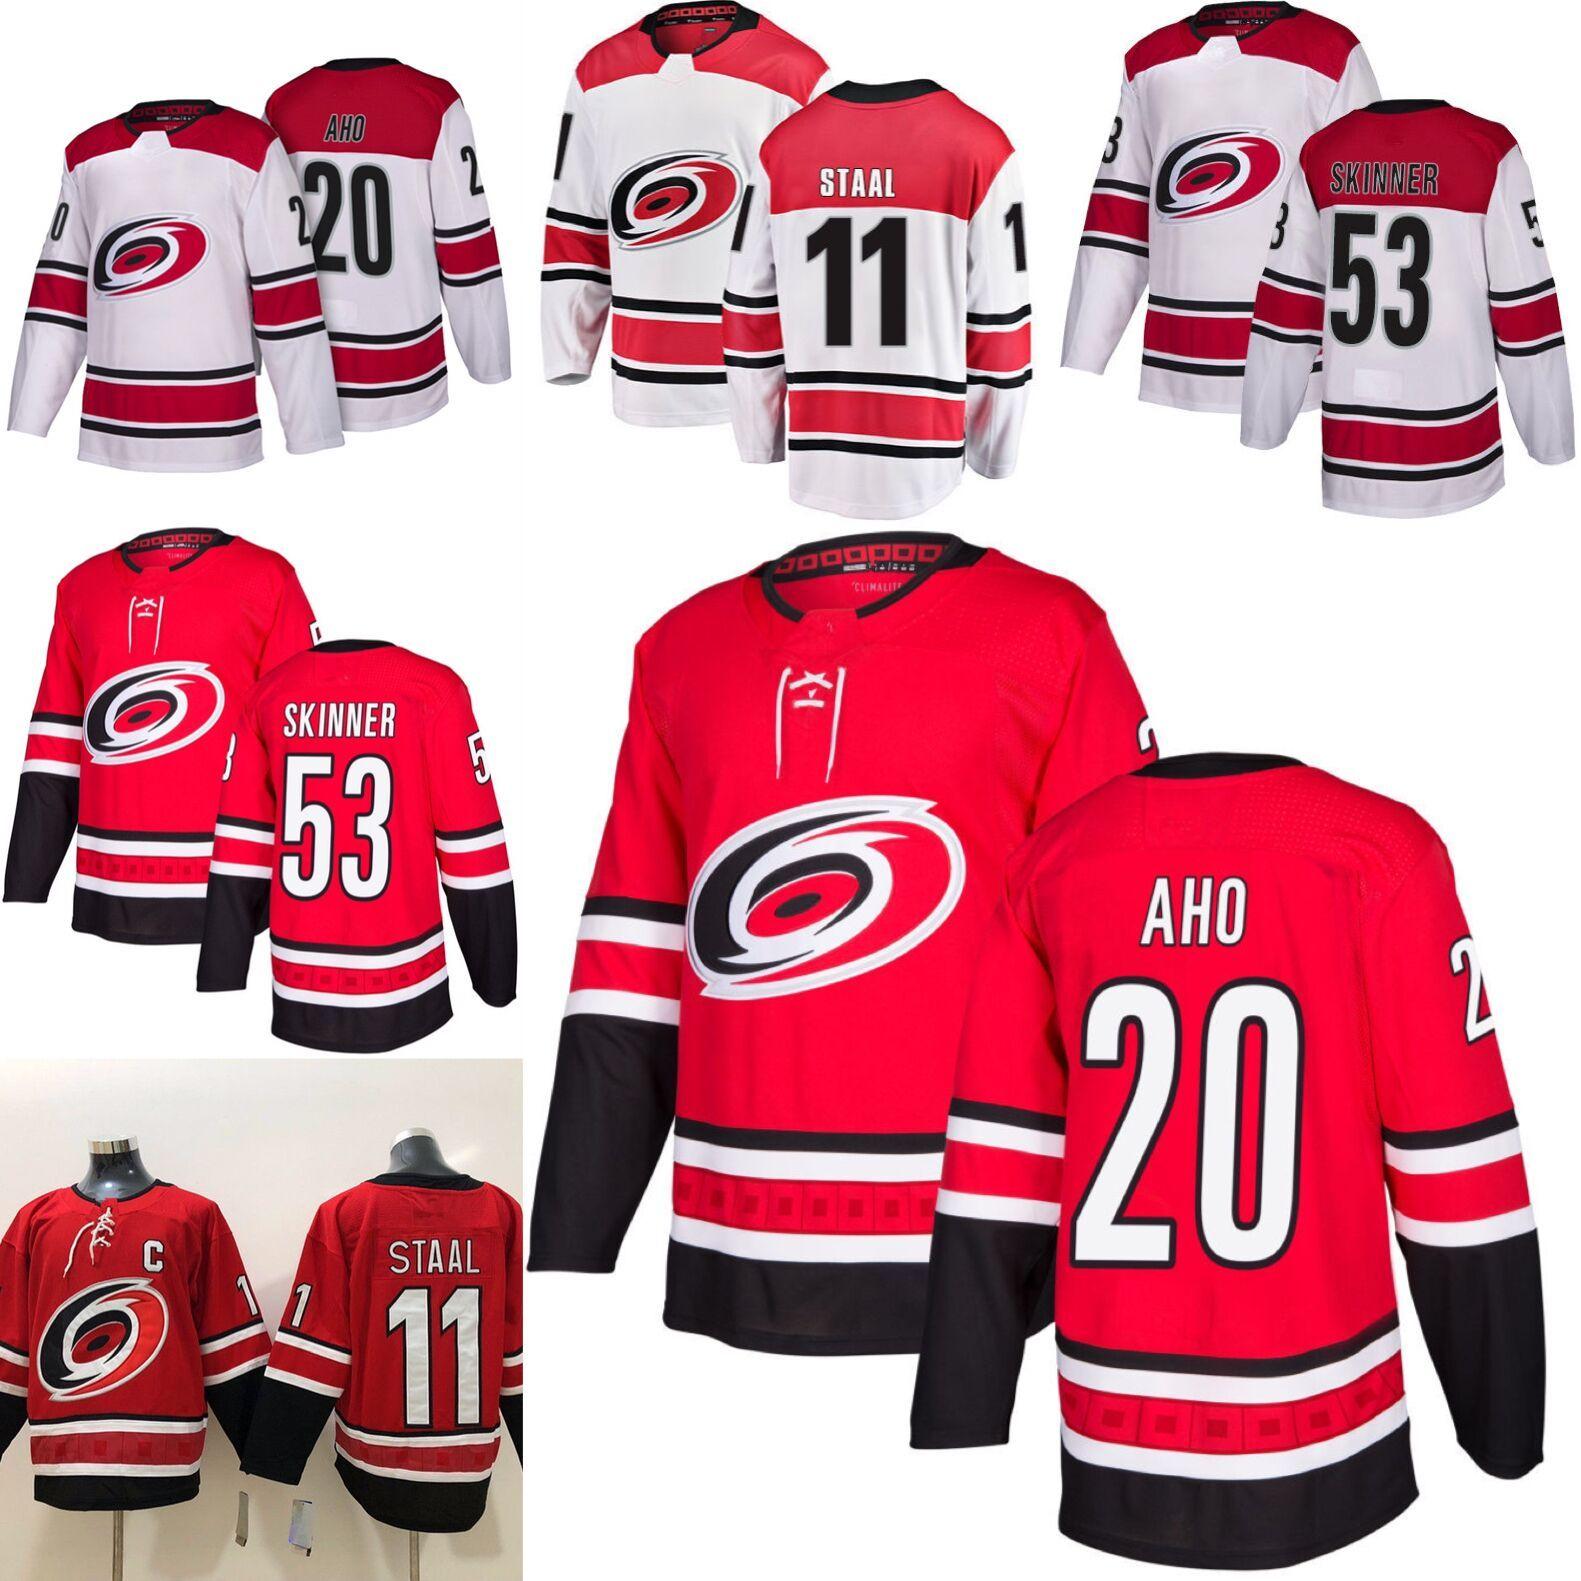 huge selection of 5b935 d906c Aho 2019 Skinner Season 11 Men All Carolina Jerseys 53 2018 ...